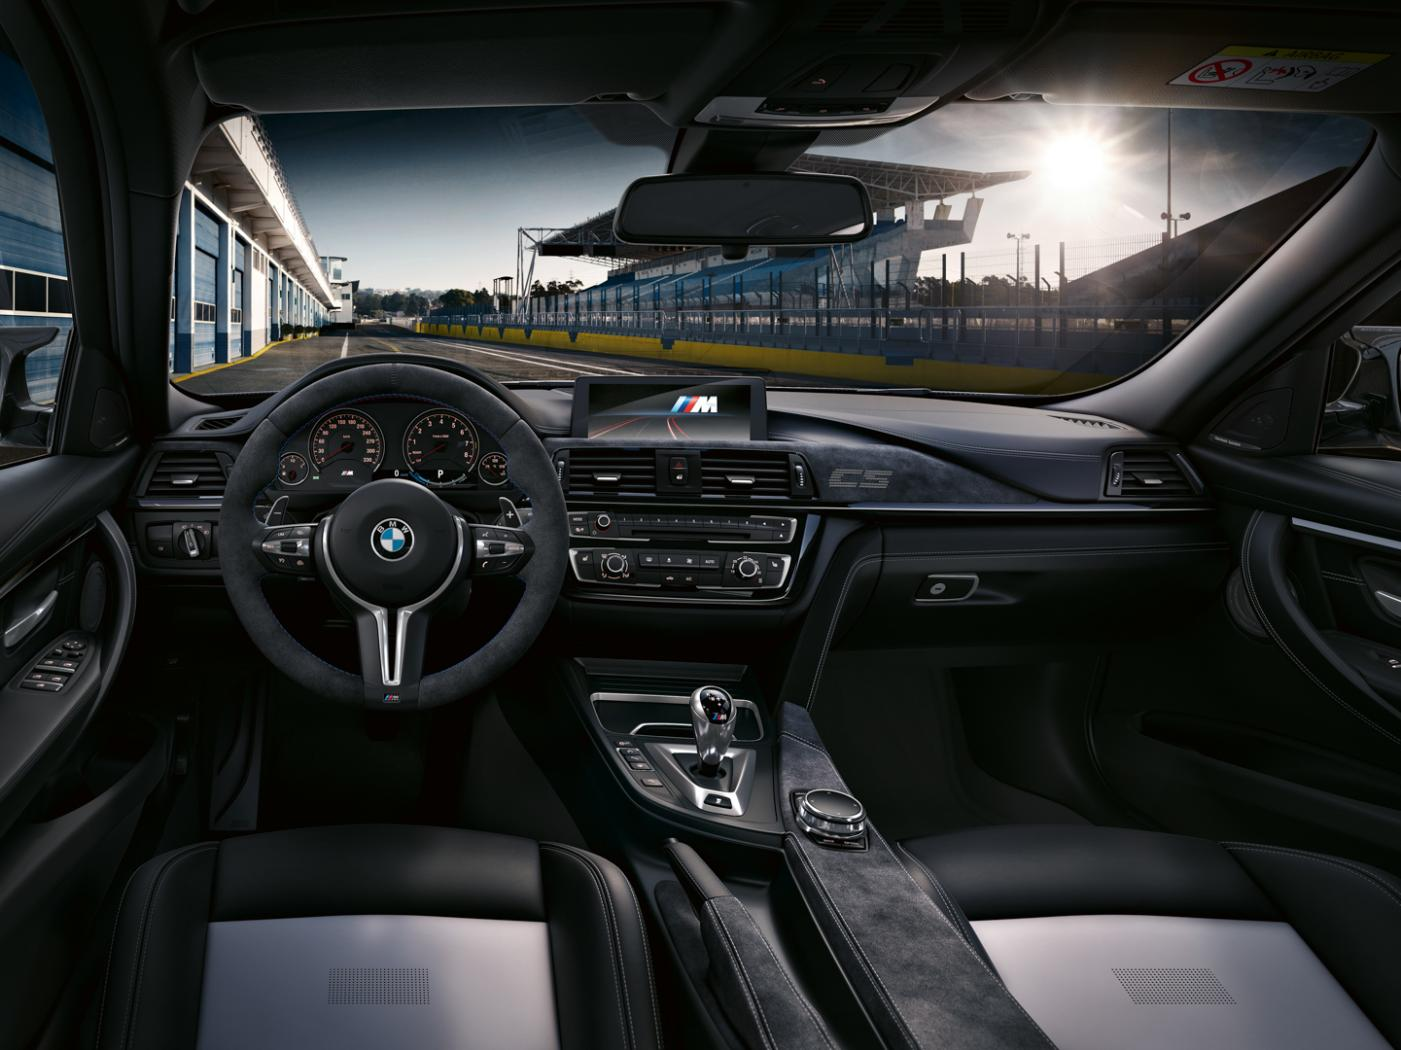 BMW-M3-F80-12.jpeg